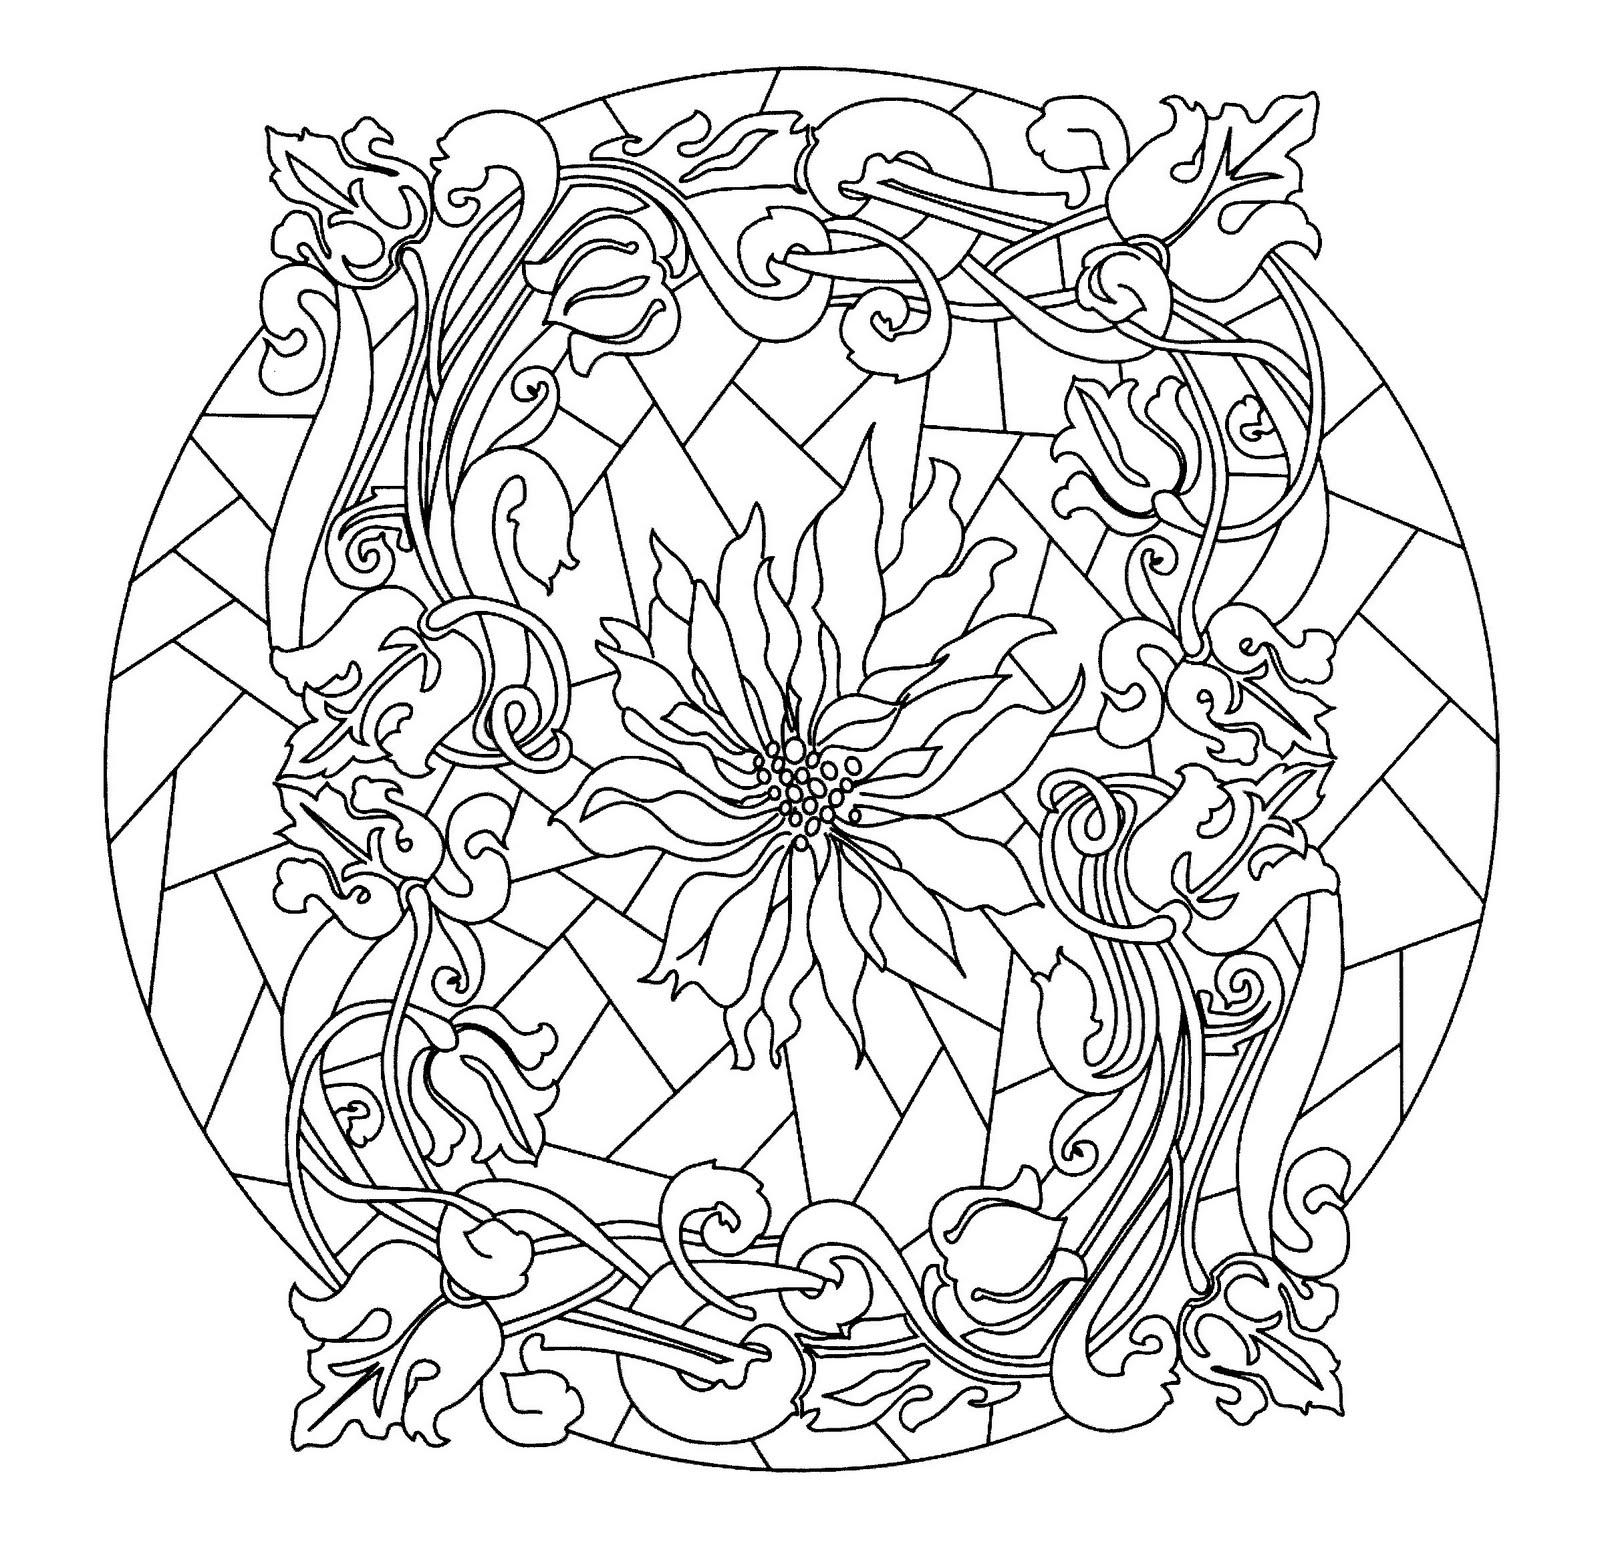 Mandalas Para Pintar: Mandala con vidriera floral